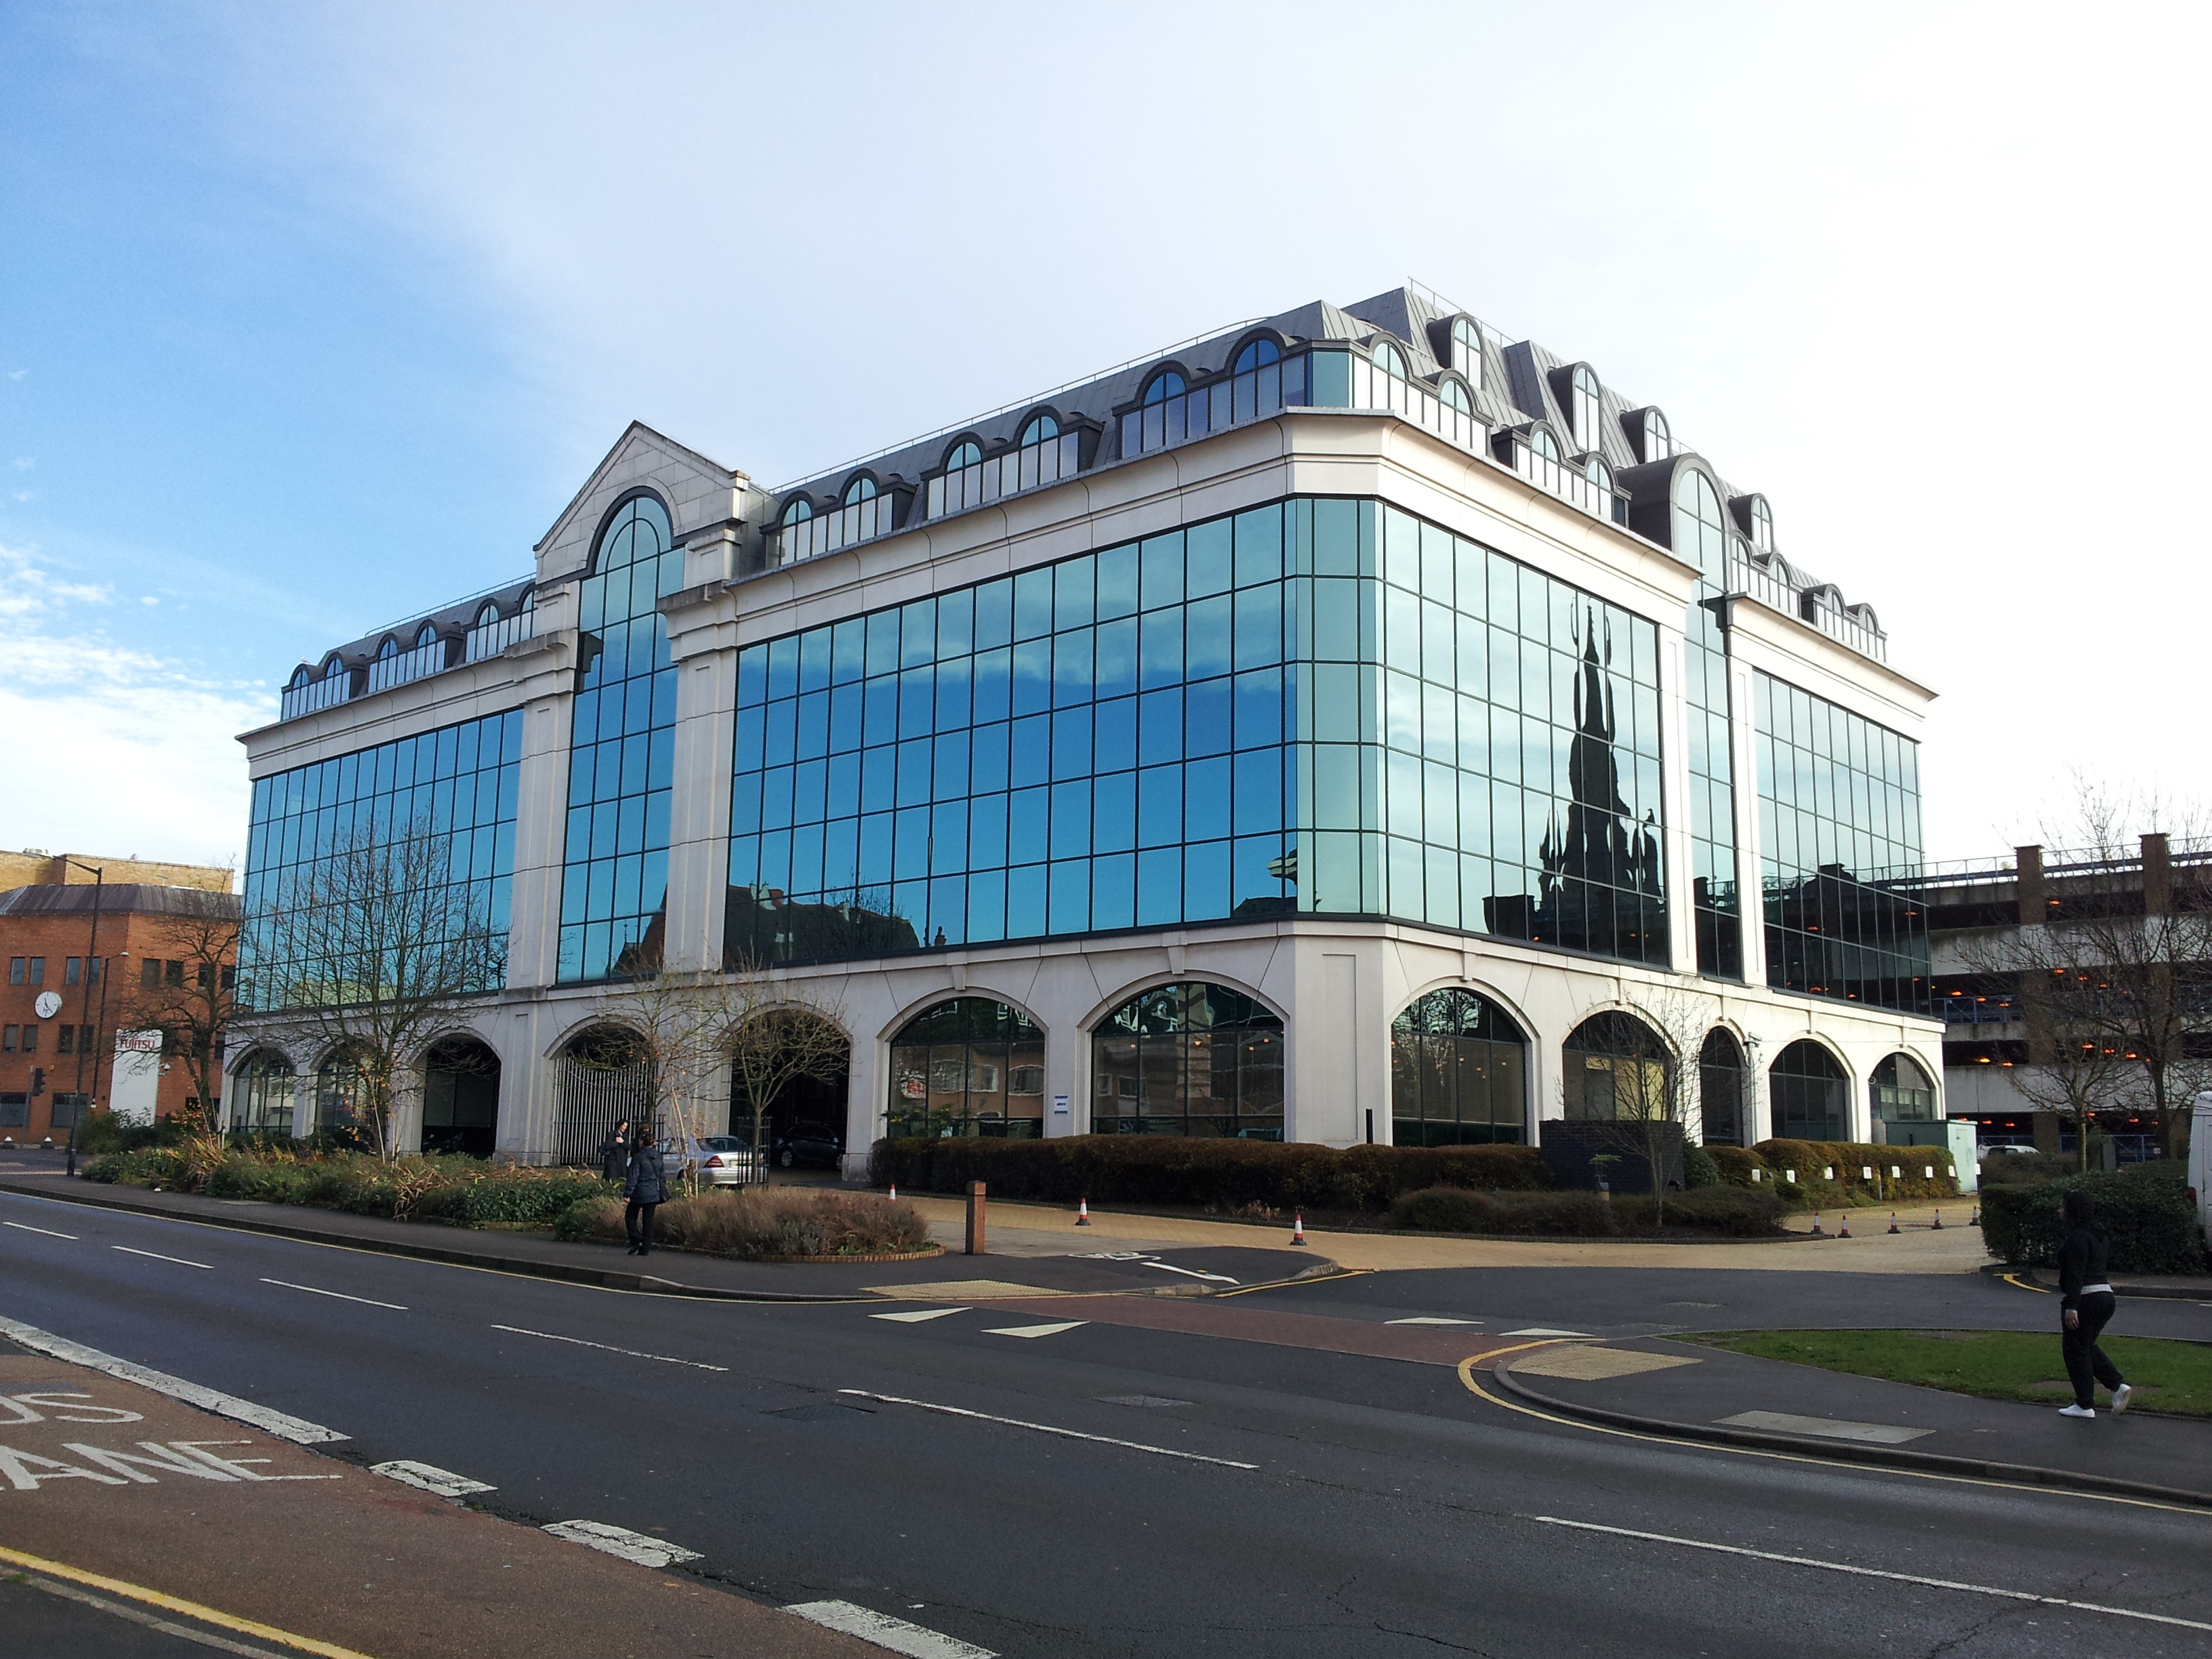 File:Modern office building (8210028813).jpg - Wikimedia Commons